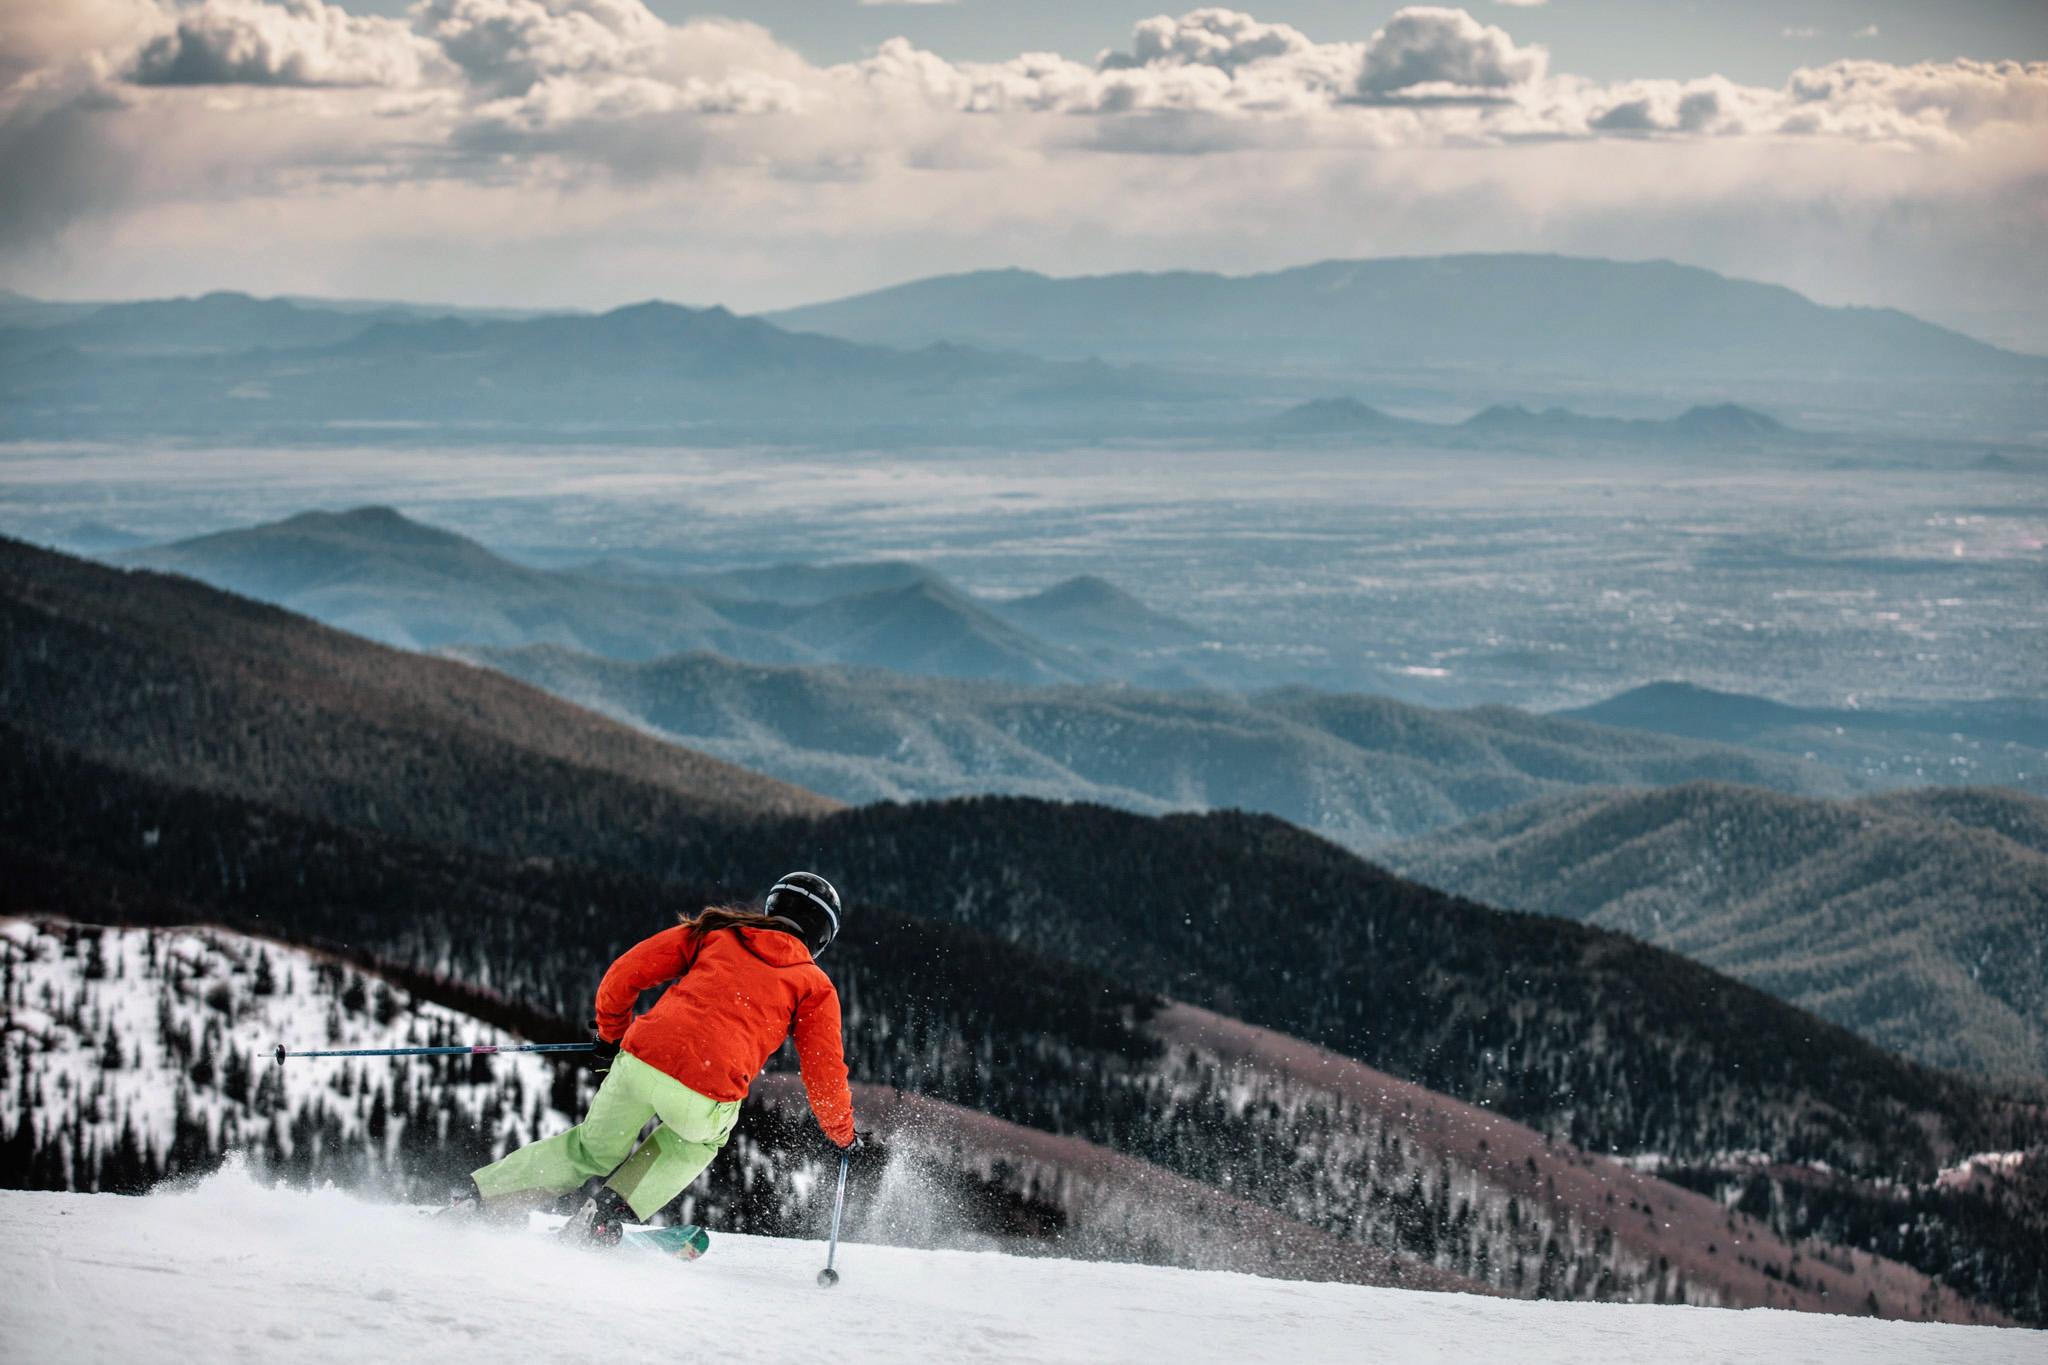 Altitude Of Santa Fe Nm >> Elevation Of Santa Fe Ski Basin Tularosa Basin 2017